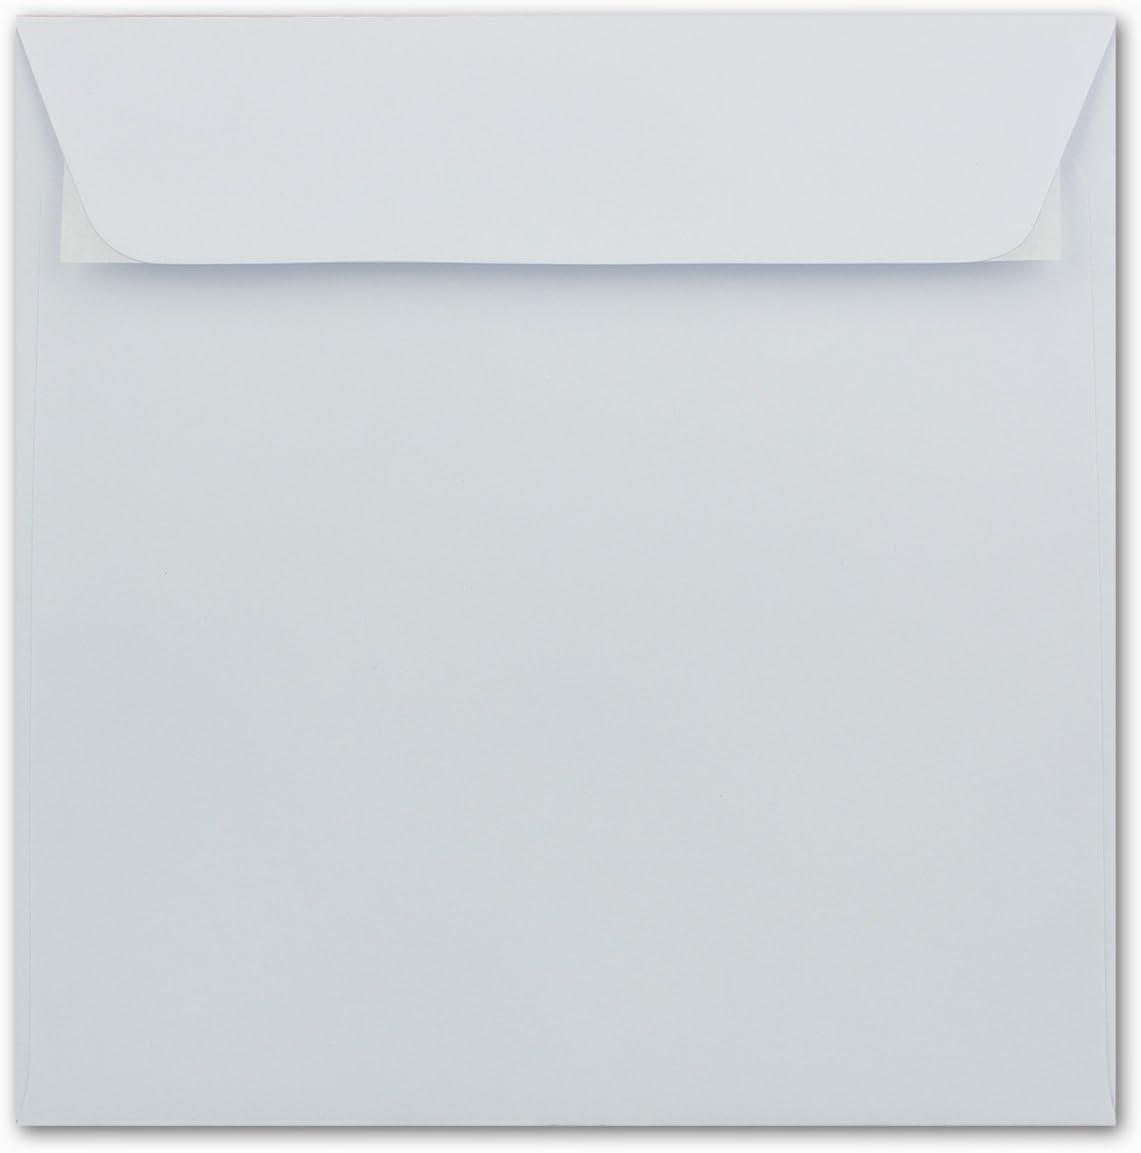 160 x 160 mm Blanc Enveloppes carr/é Collage adh/ésif 50 Umschl/äge Wei/ß